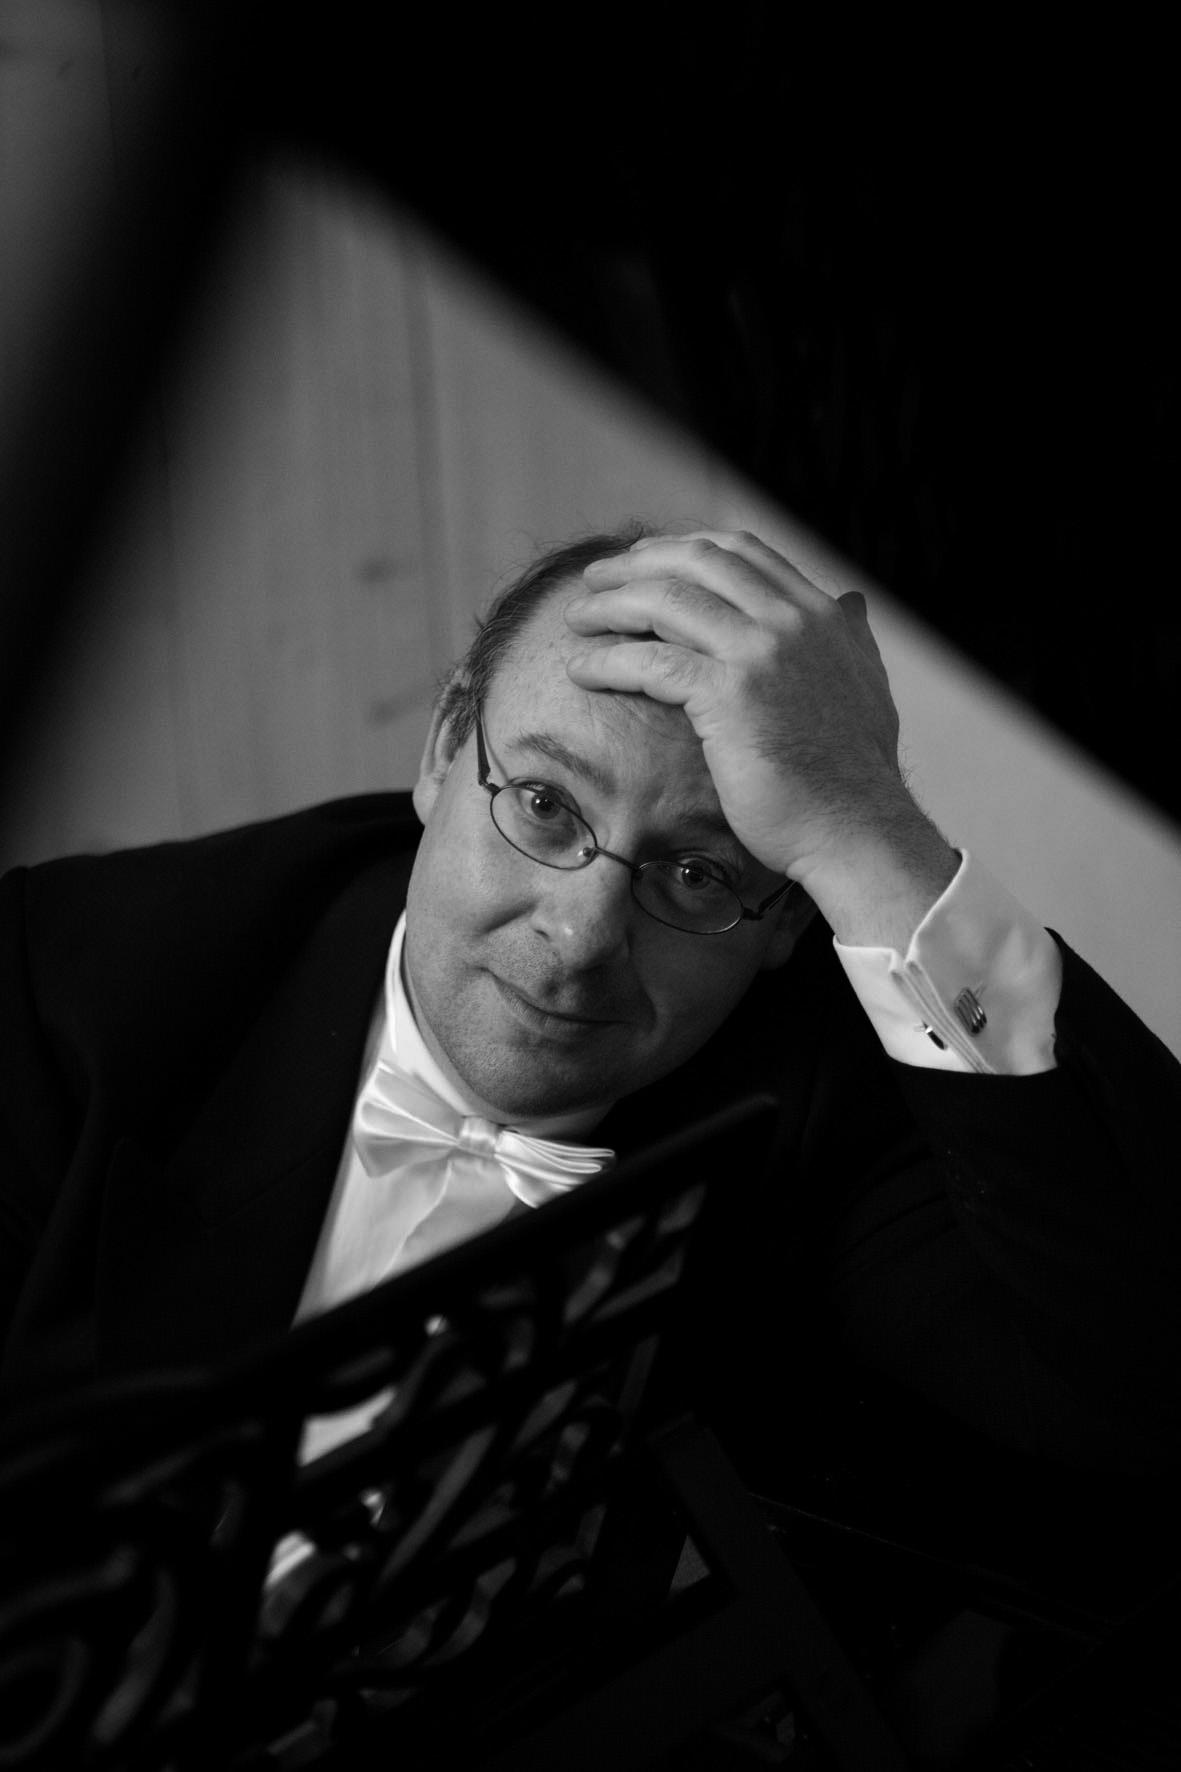 Arthur Schoenderwoerd